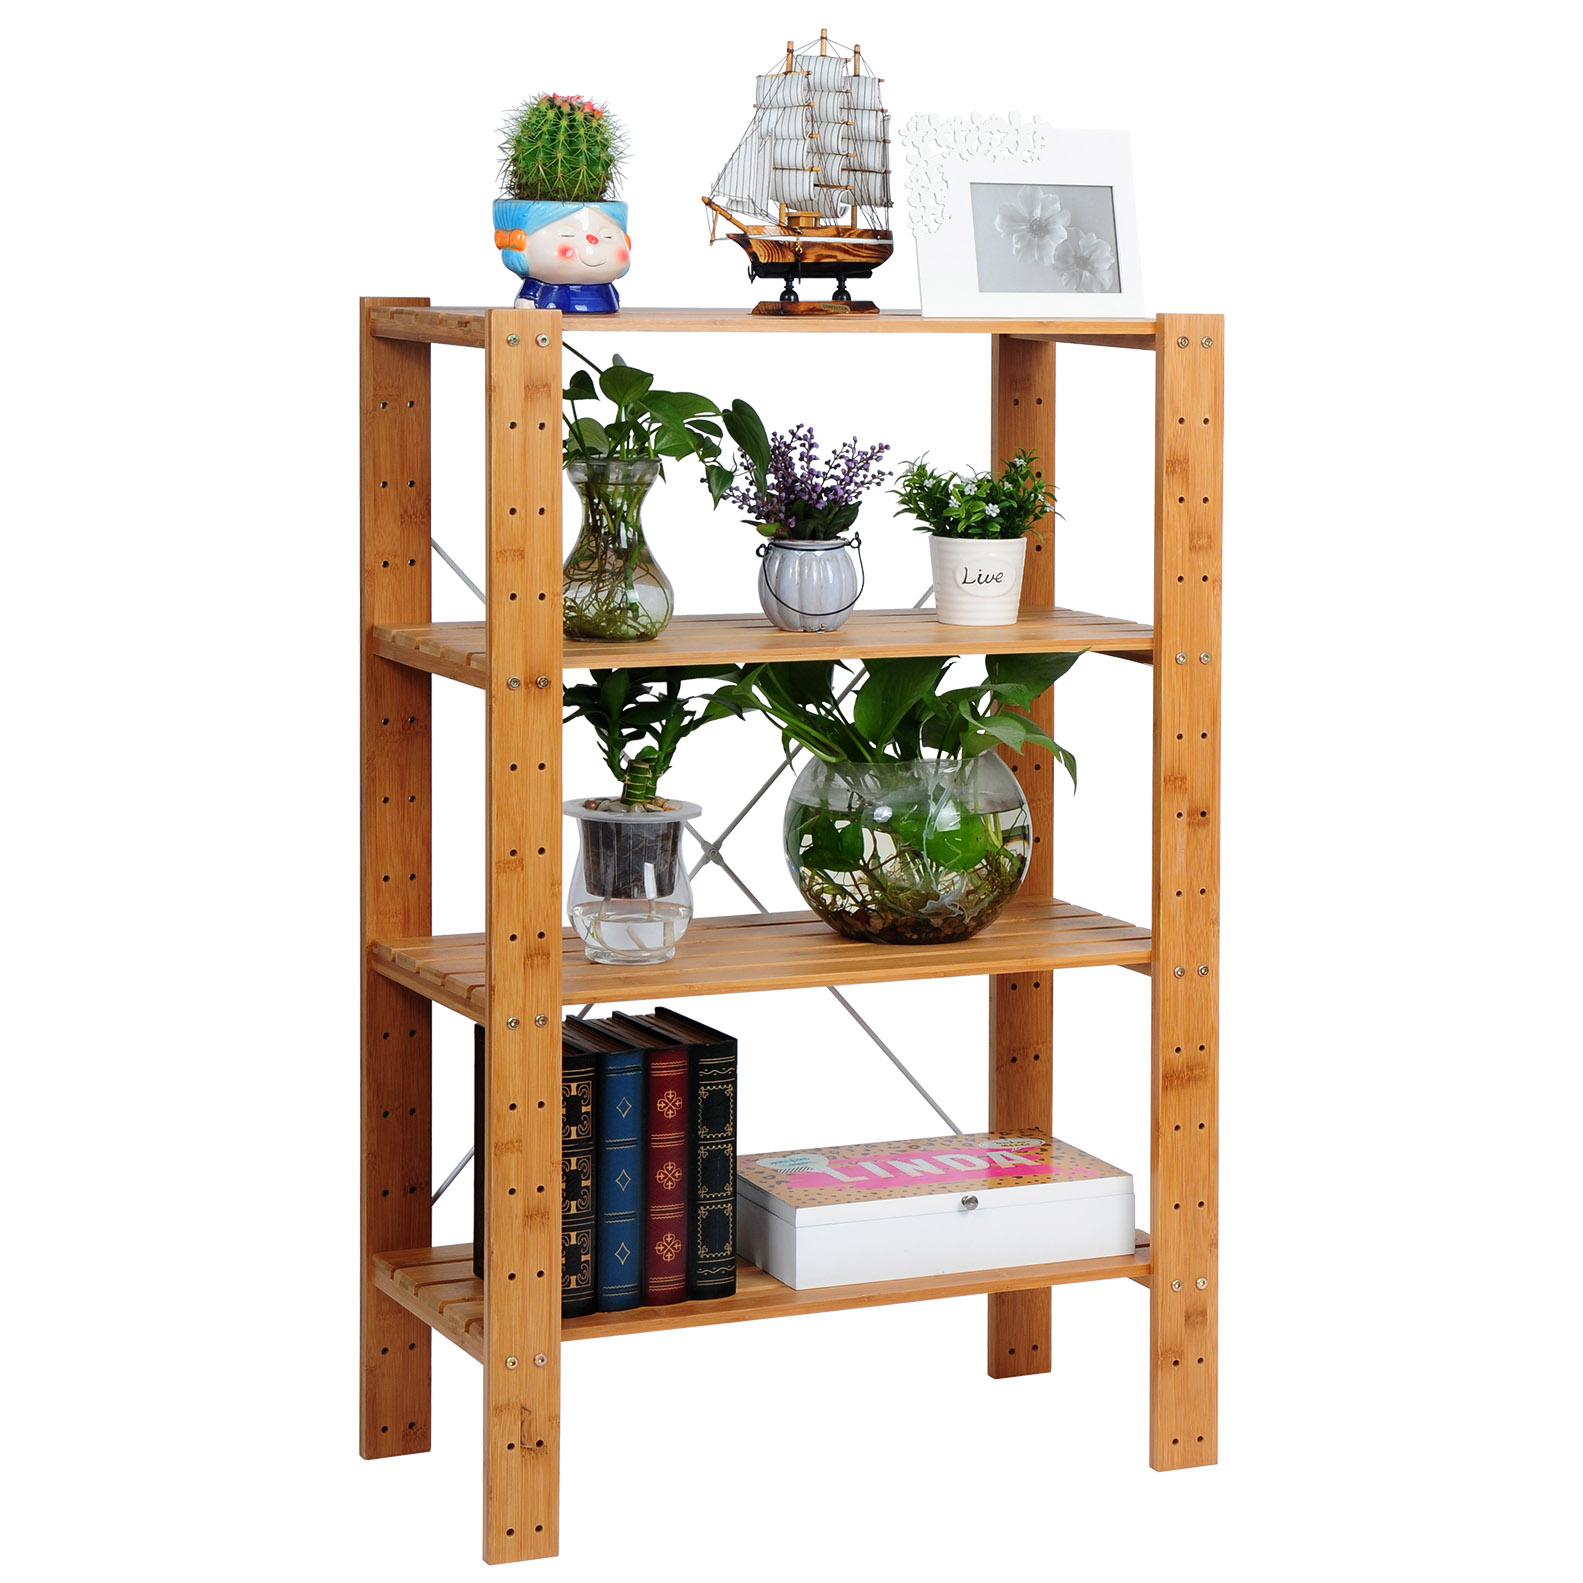 tag re en bambou tag res debout salle de bain cuisine tag re rangement f123 ebay. Black Bedroom Furniture Sets. Home Design Ideas